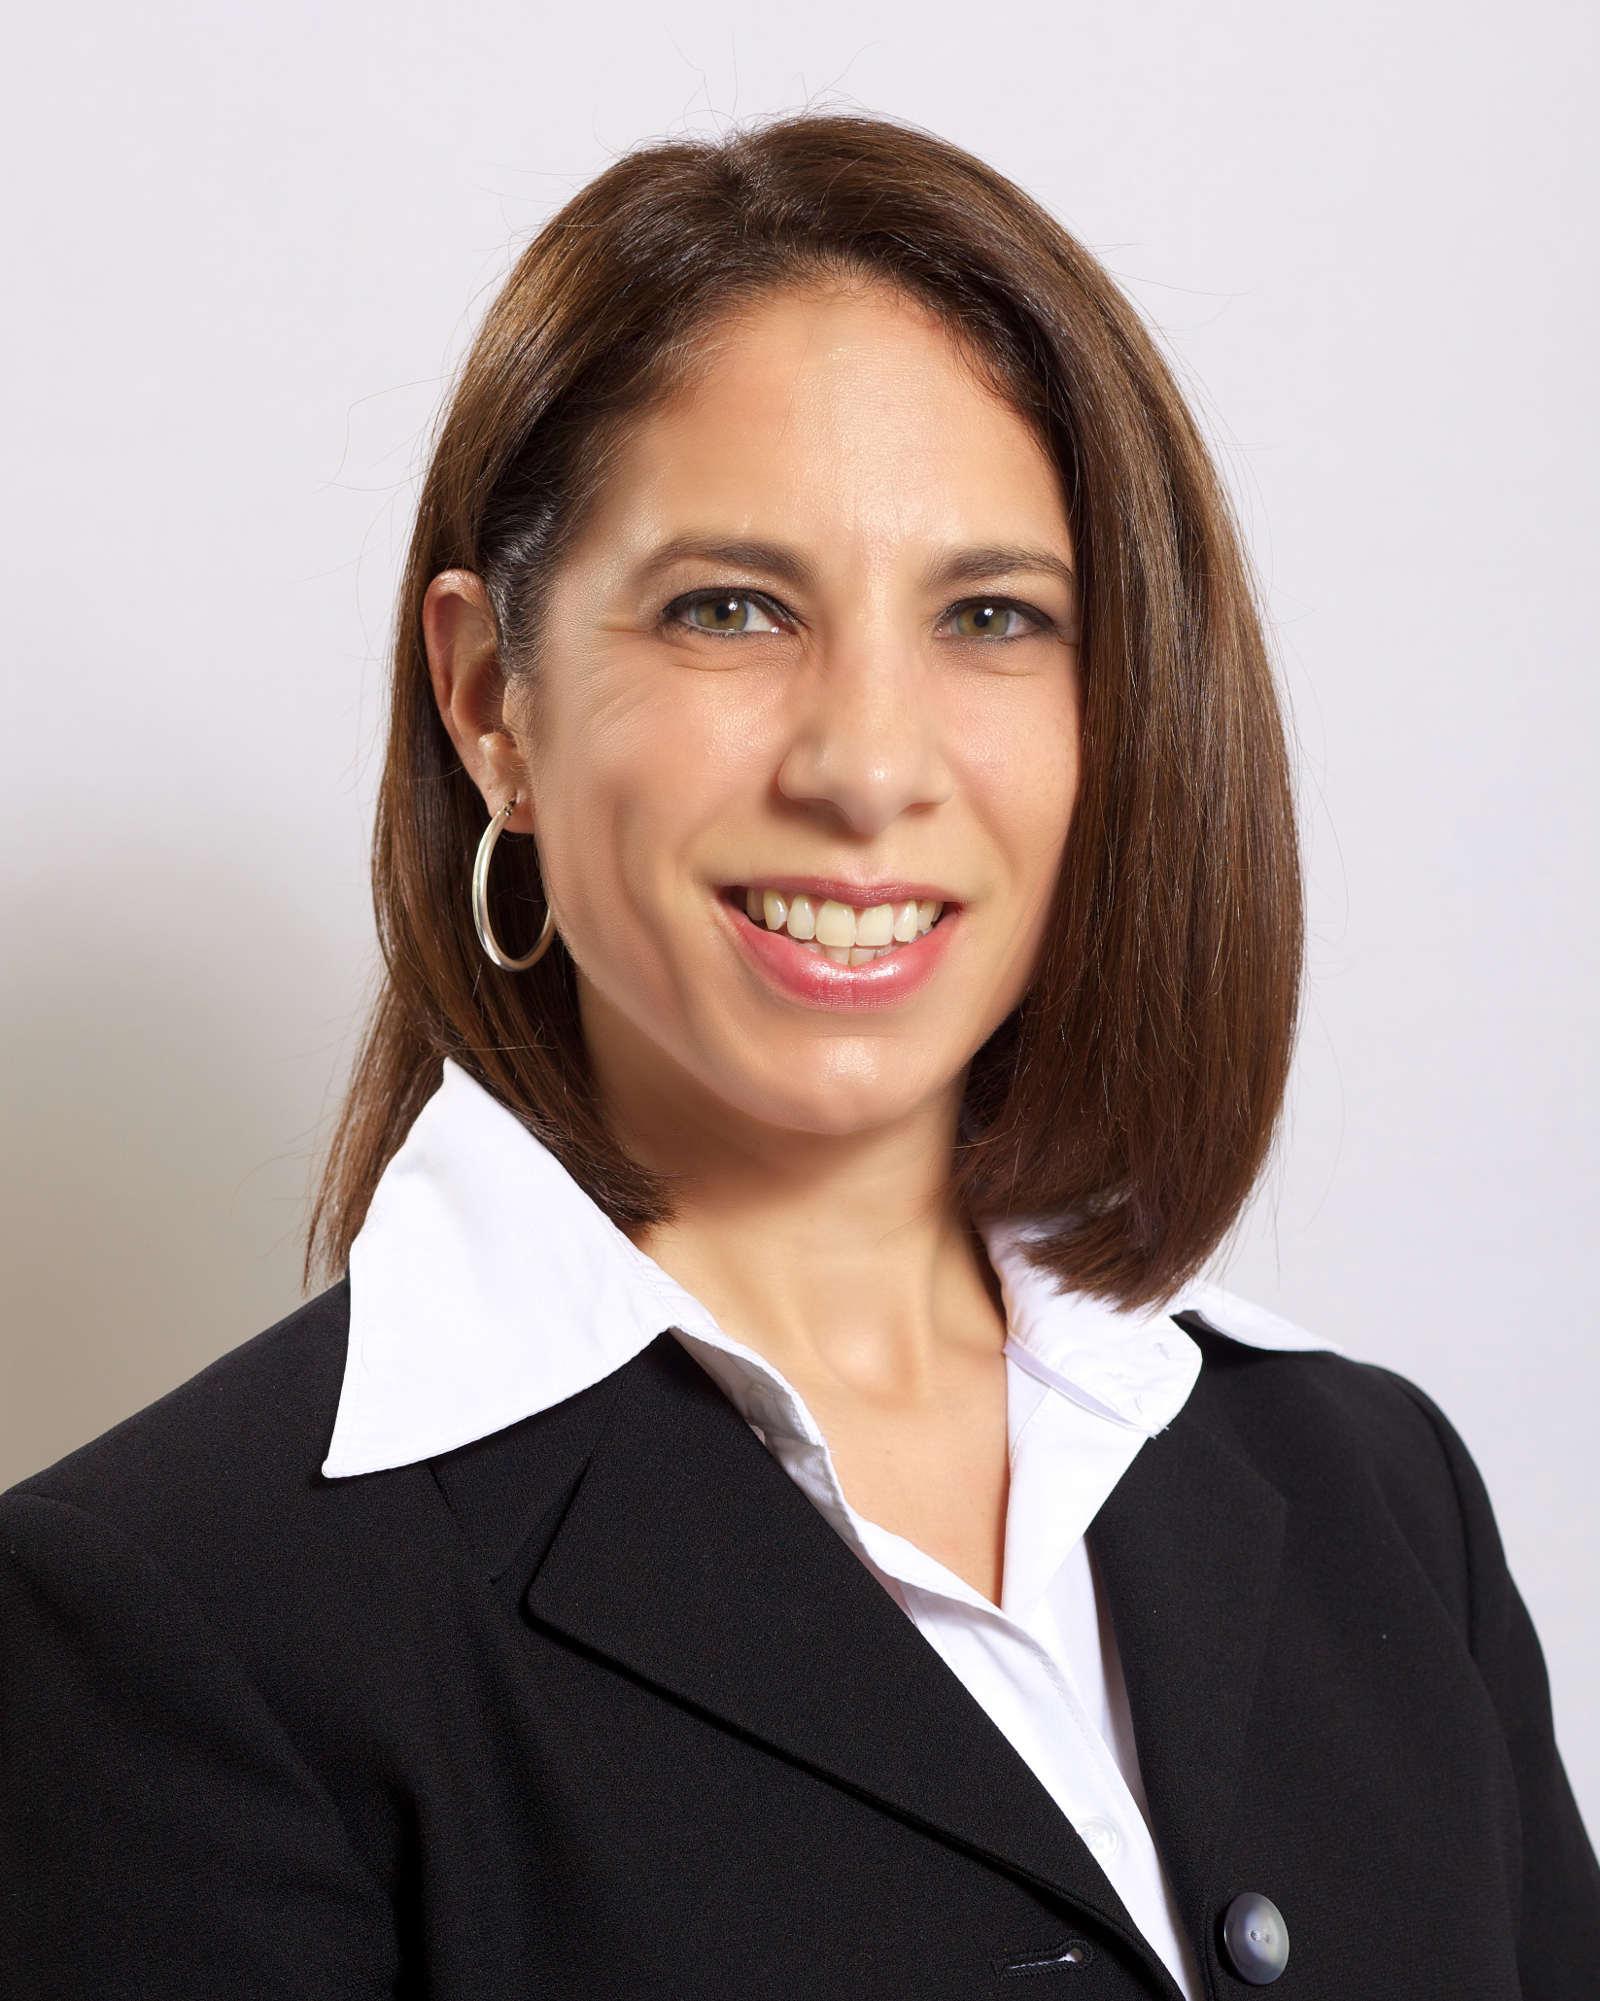 Iris Garavuso, Ted Todd Insurance Agency, Delray Marketplace